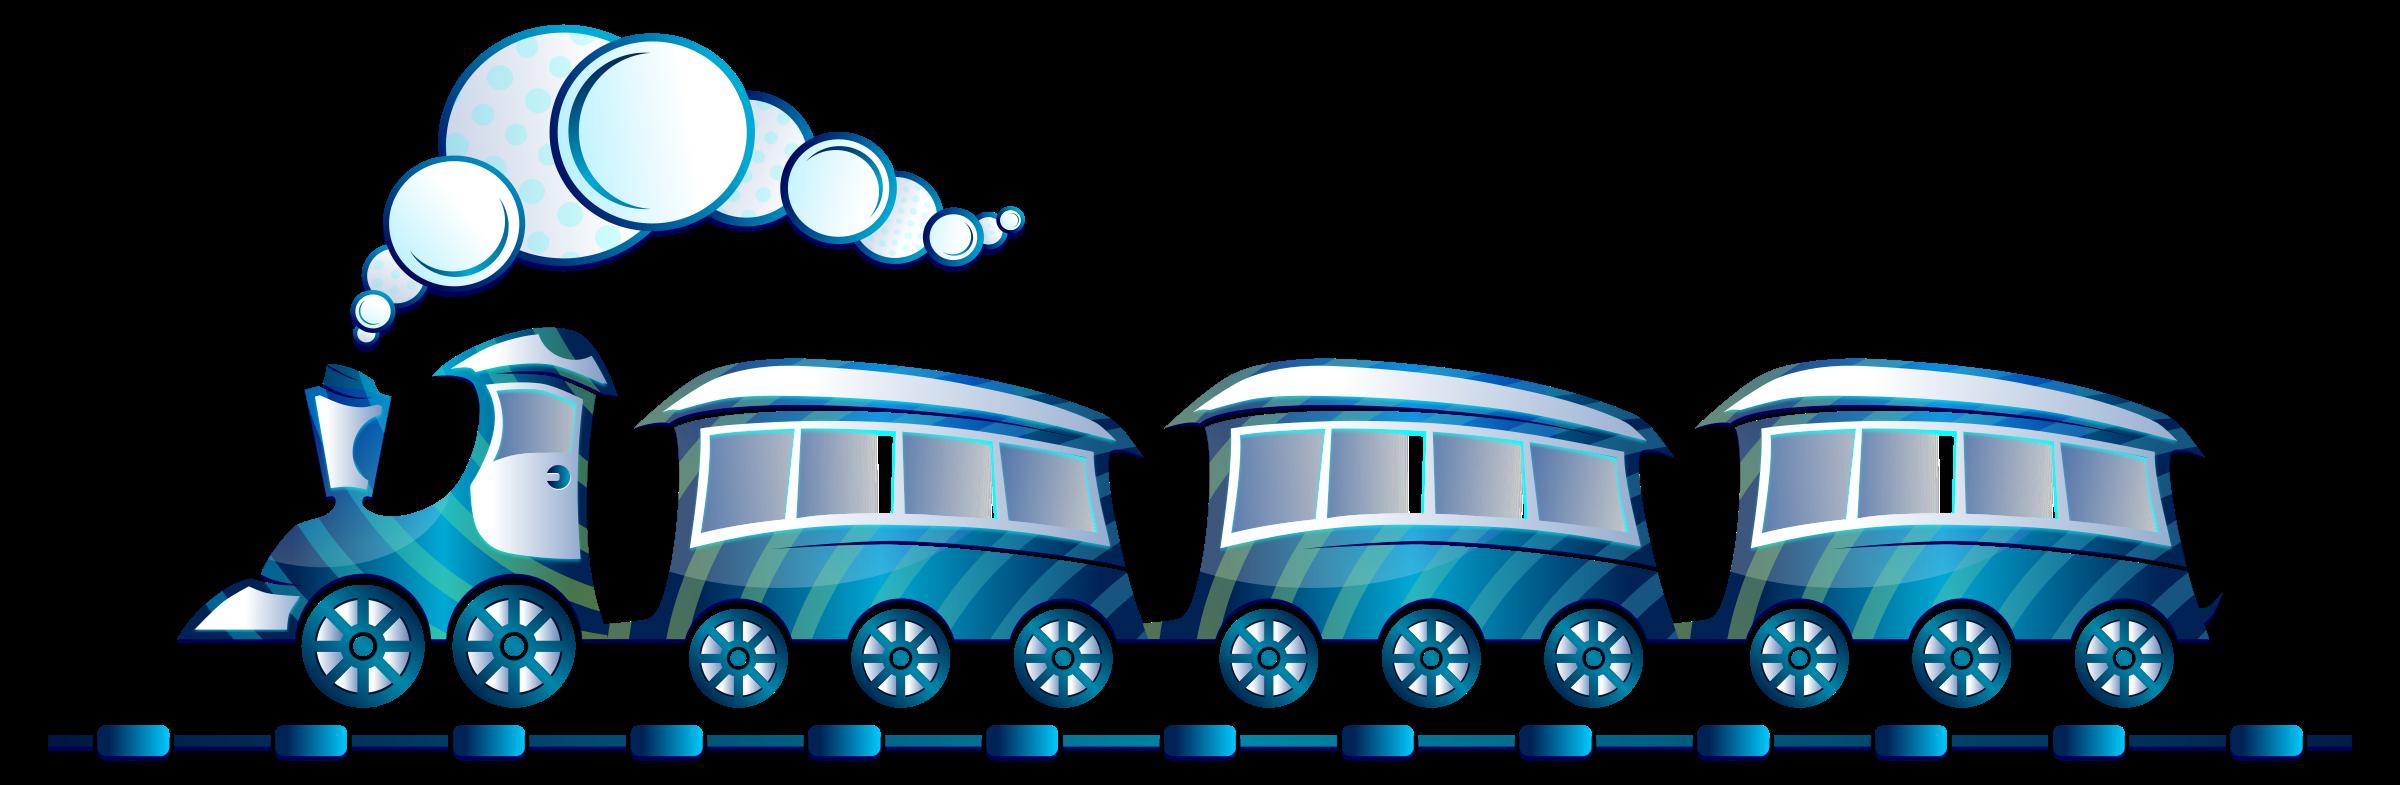 Locomotive clipart choo choo train Free Art Clip Art Choo